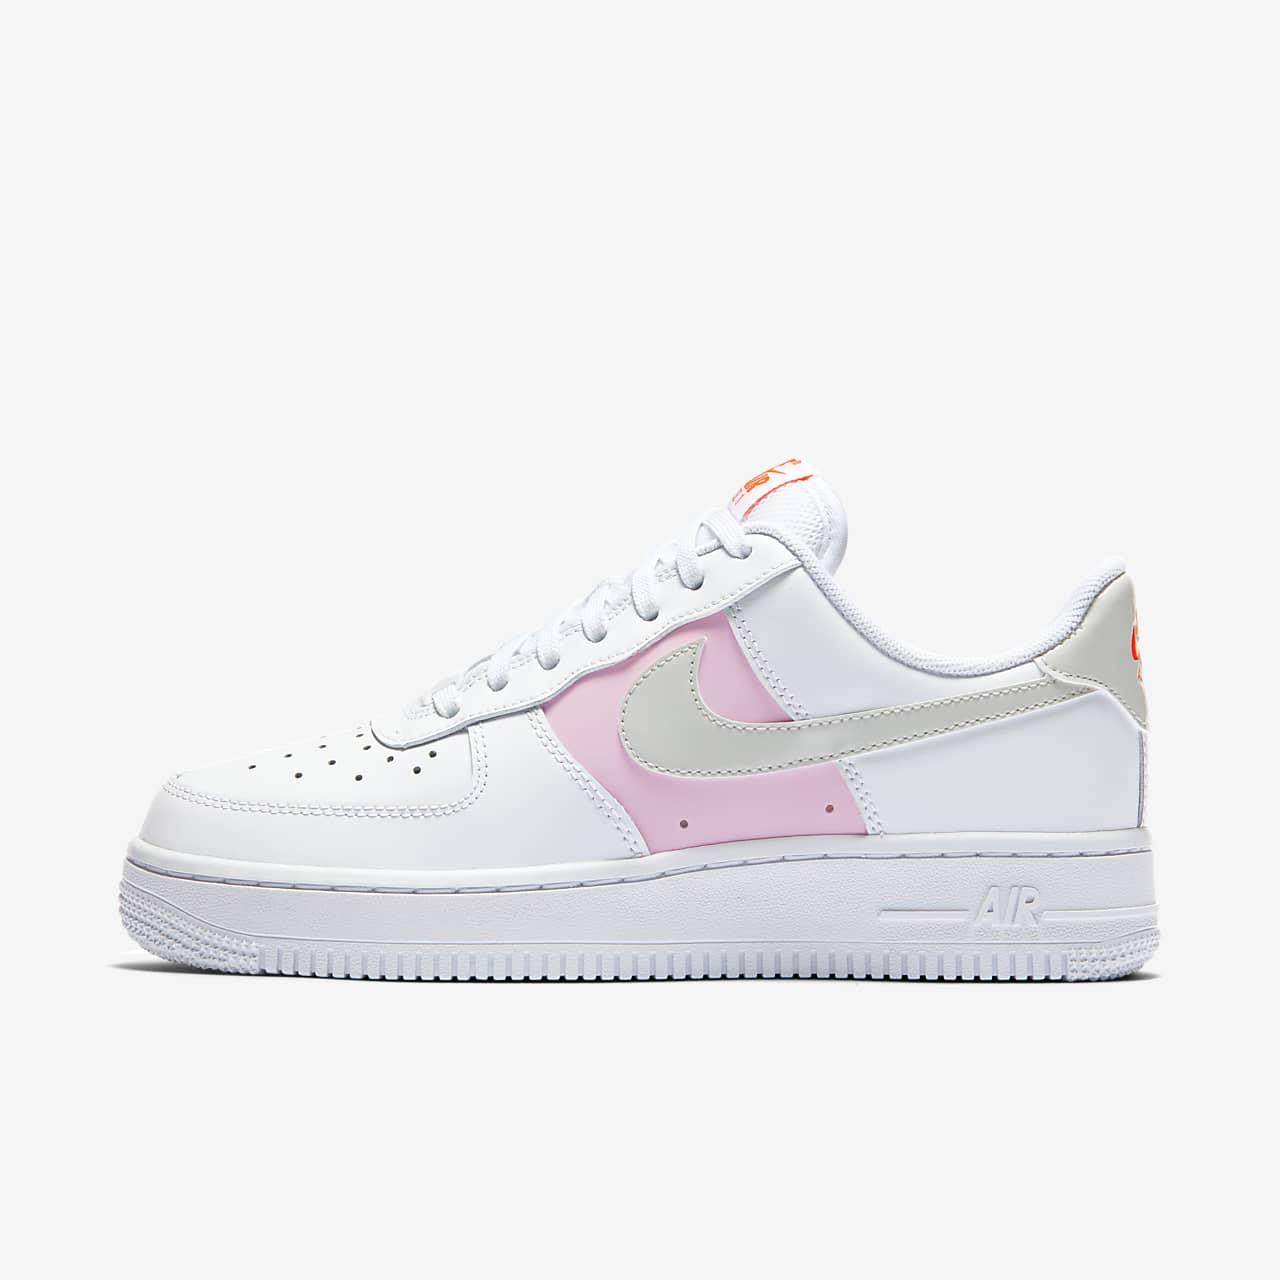 baskets nike femme air force 1 07